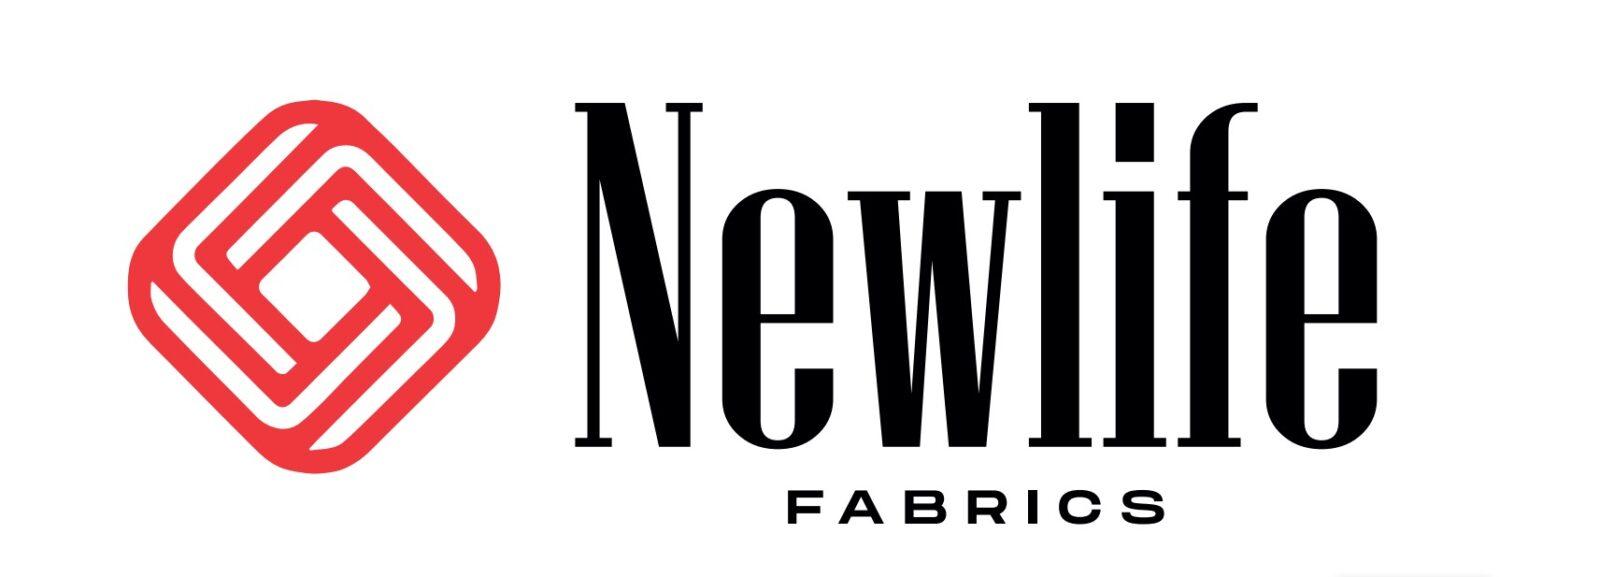 NEWLIFE FABRICS